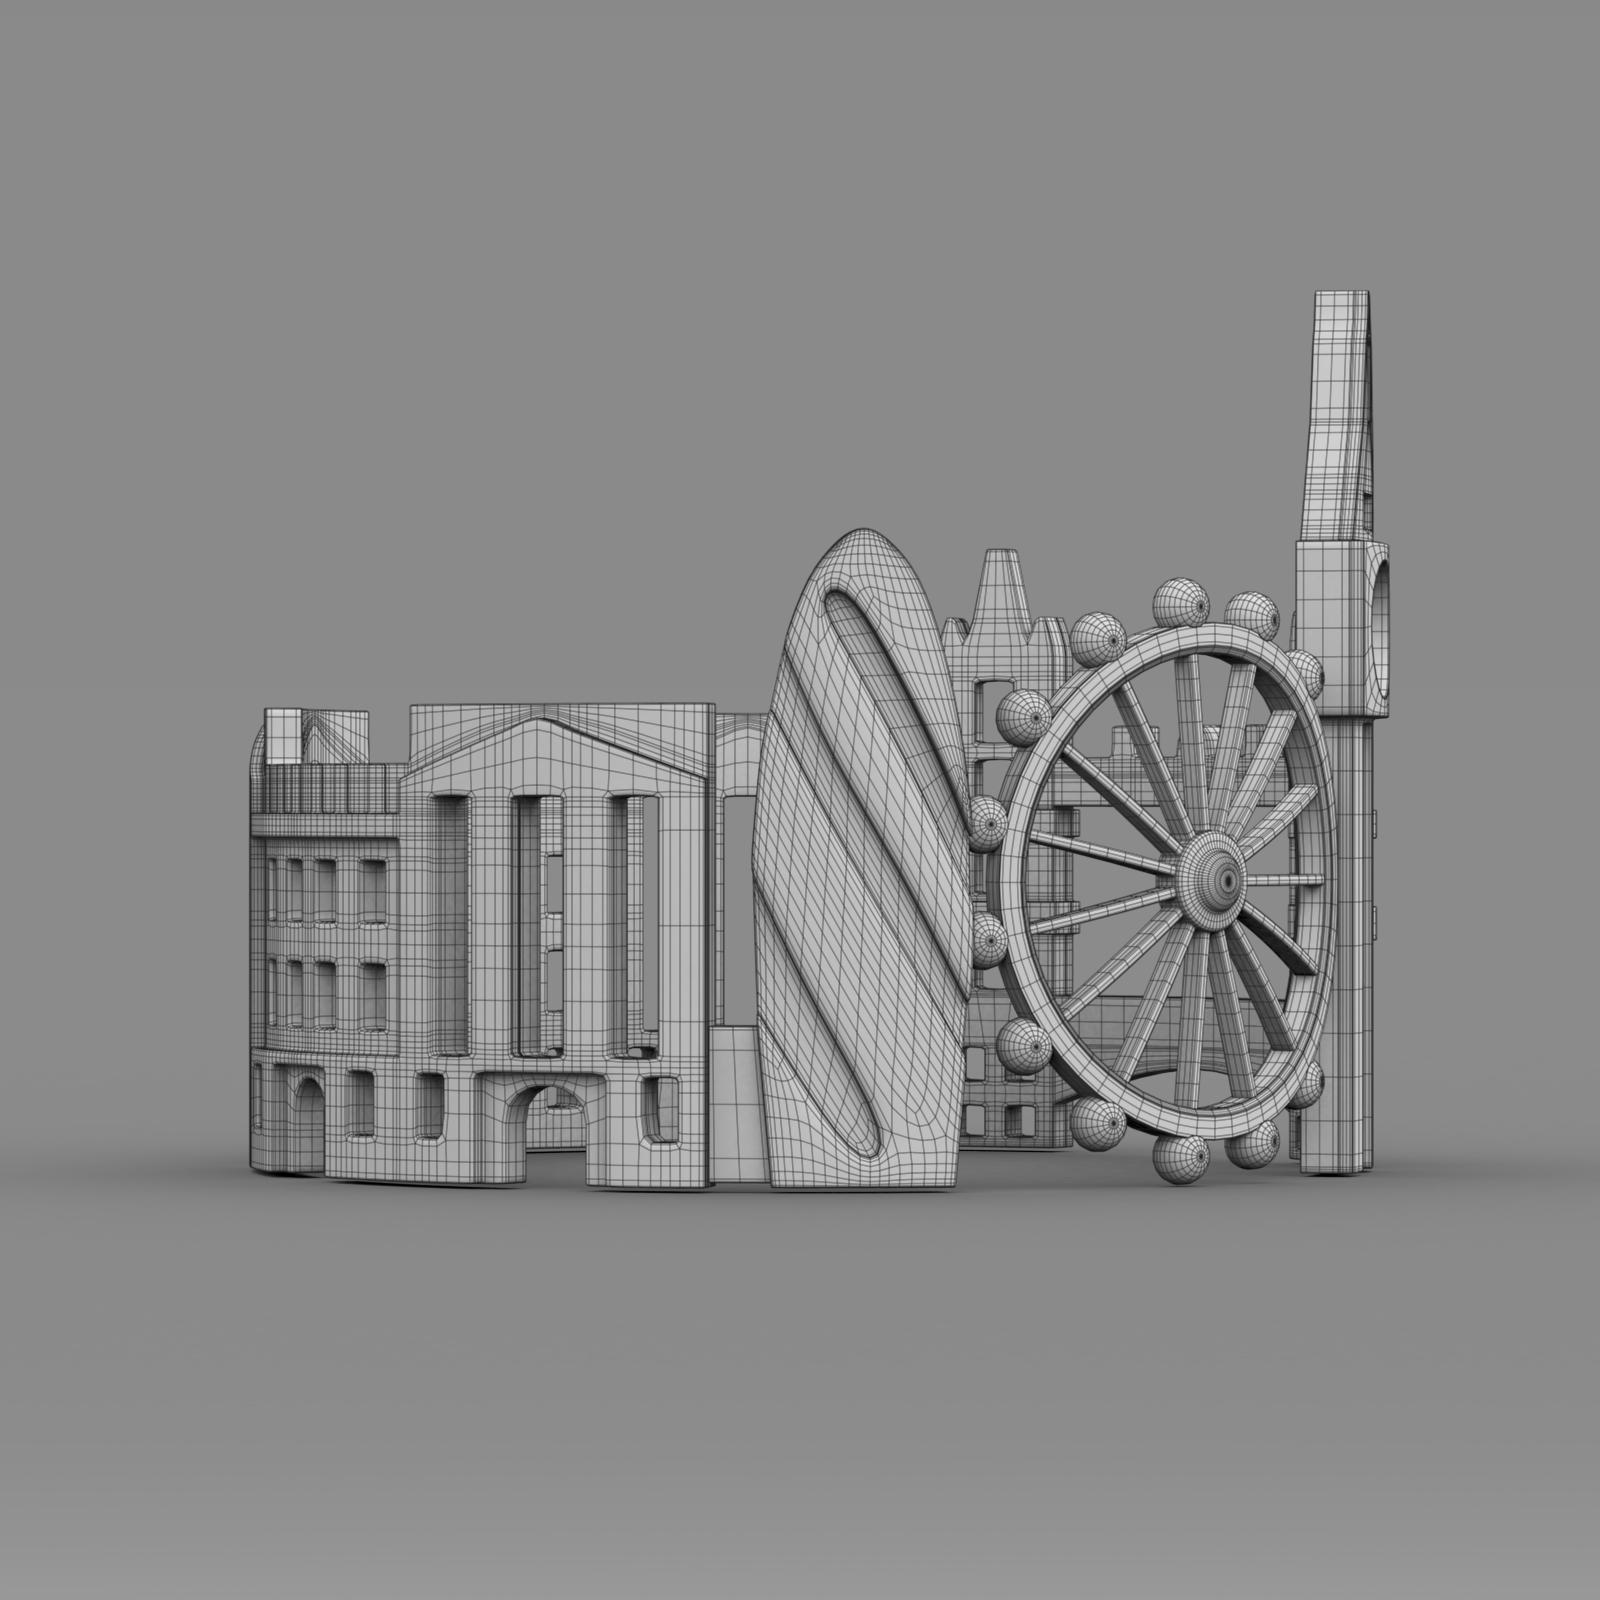 cityscape design ring london 3d model 3ds fbx c4d lwo ma mb 3dm hrc xsi  obj 271350